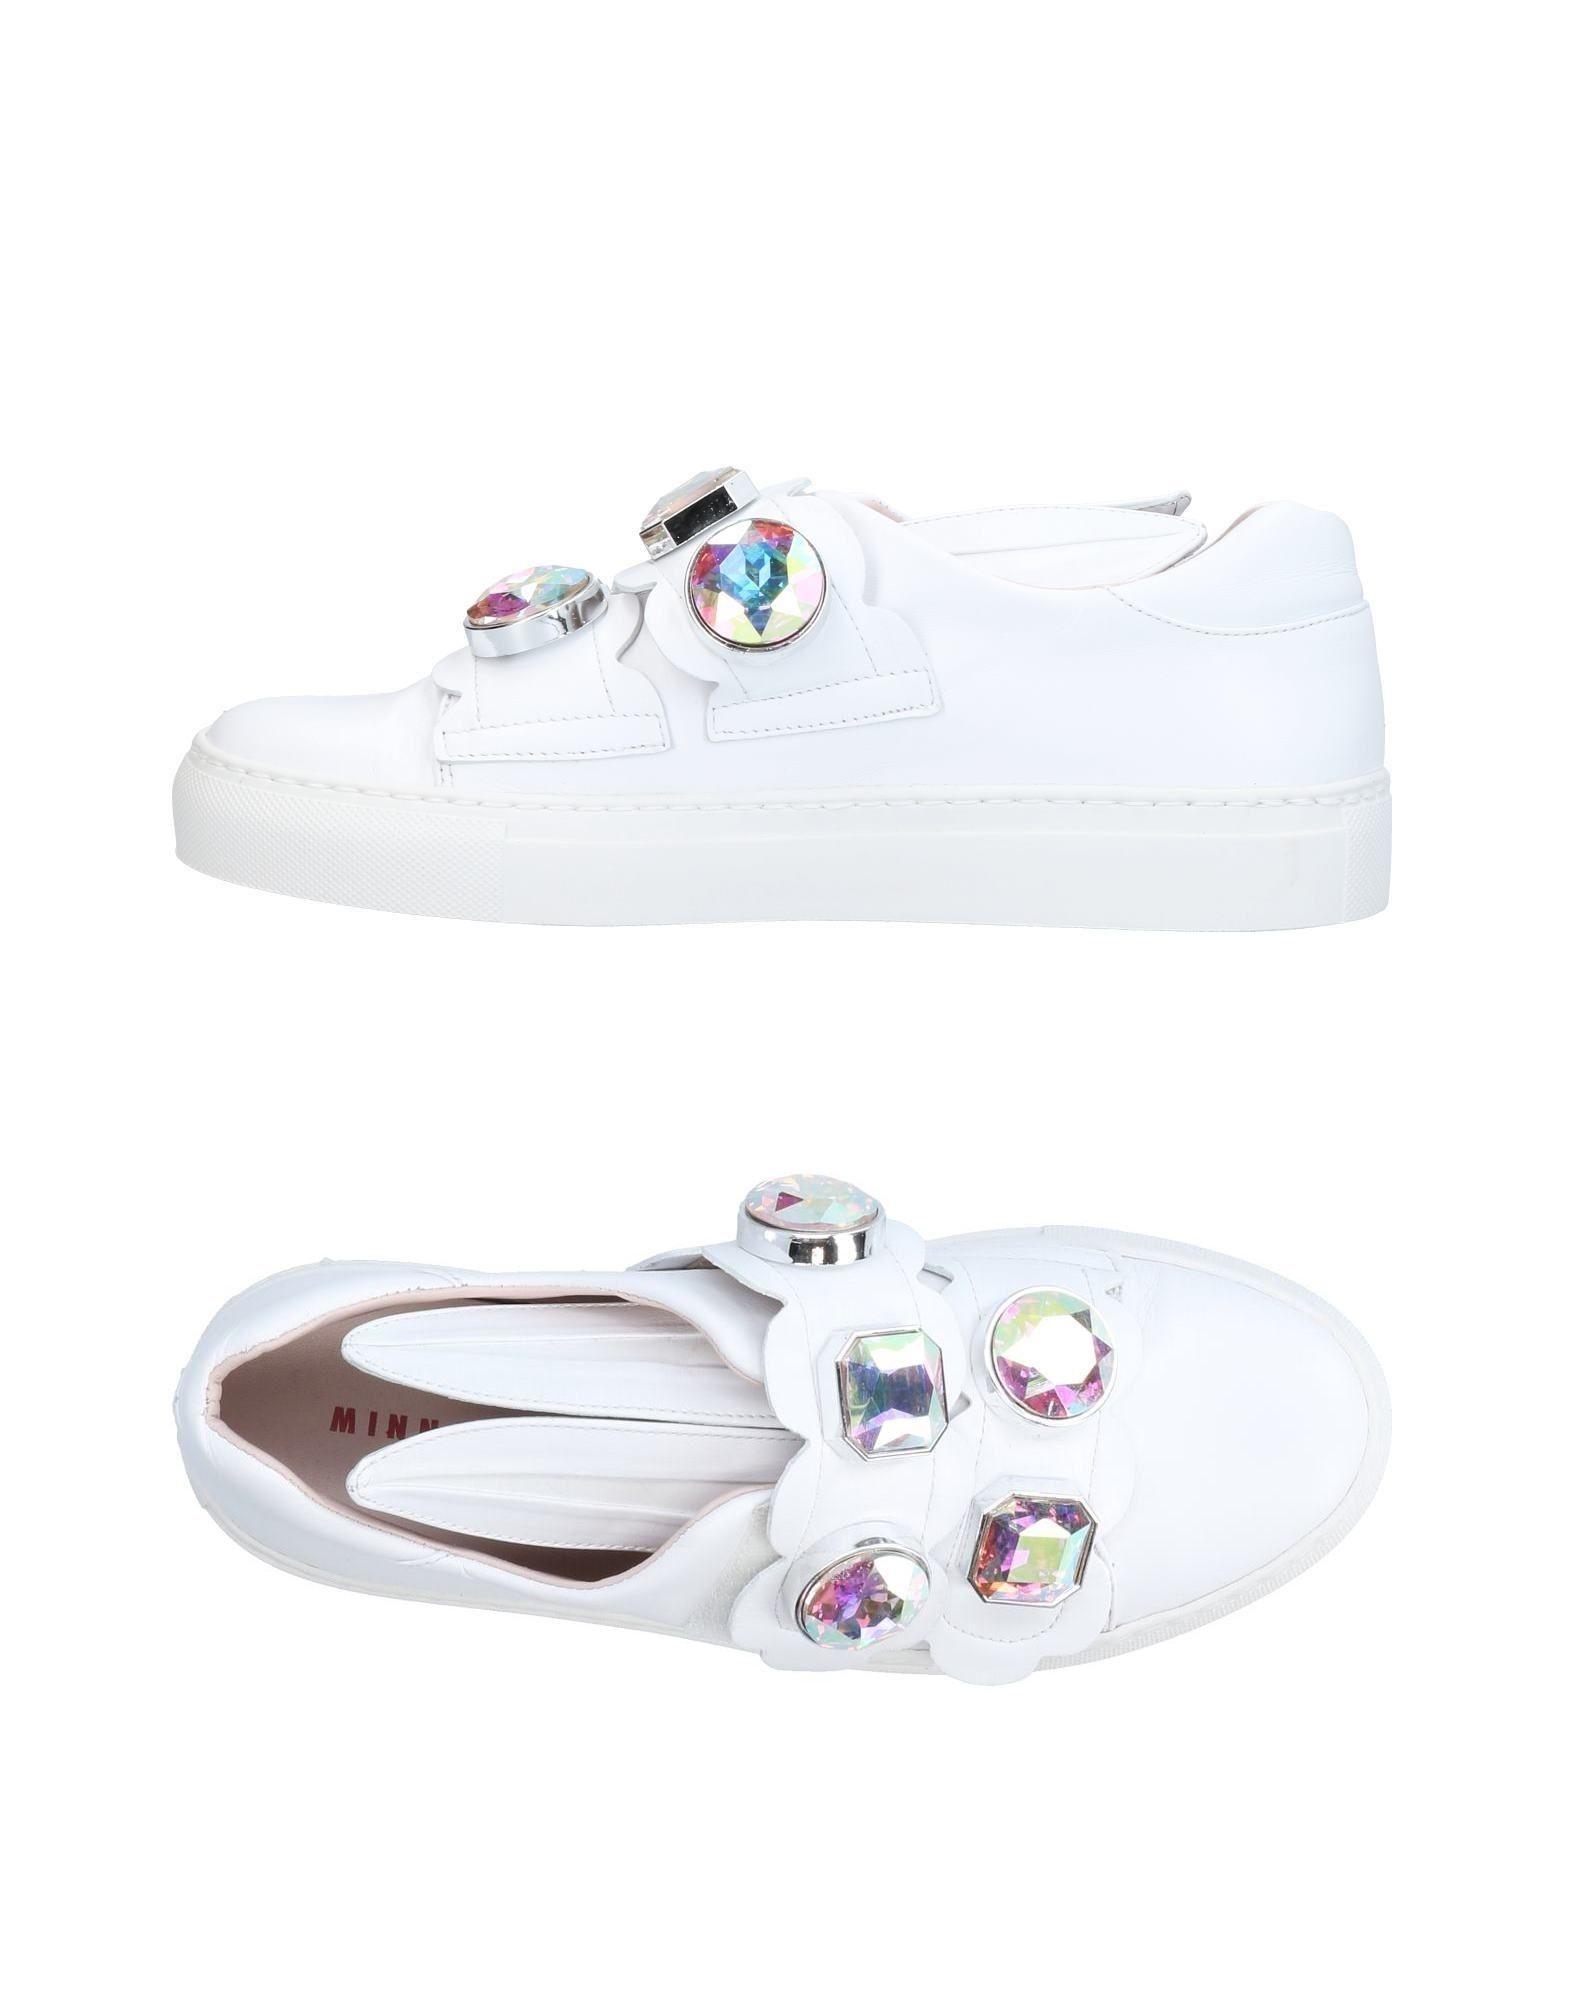 Minna Parikka Sneakers In White